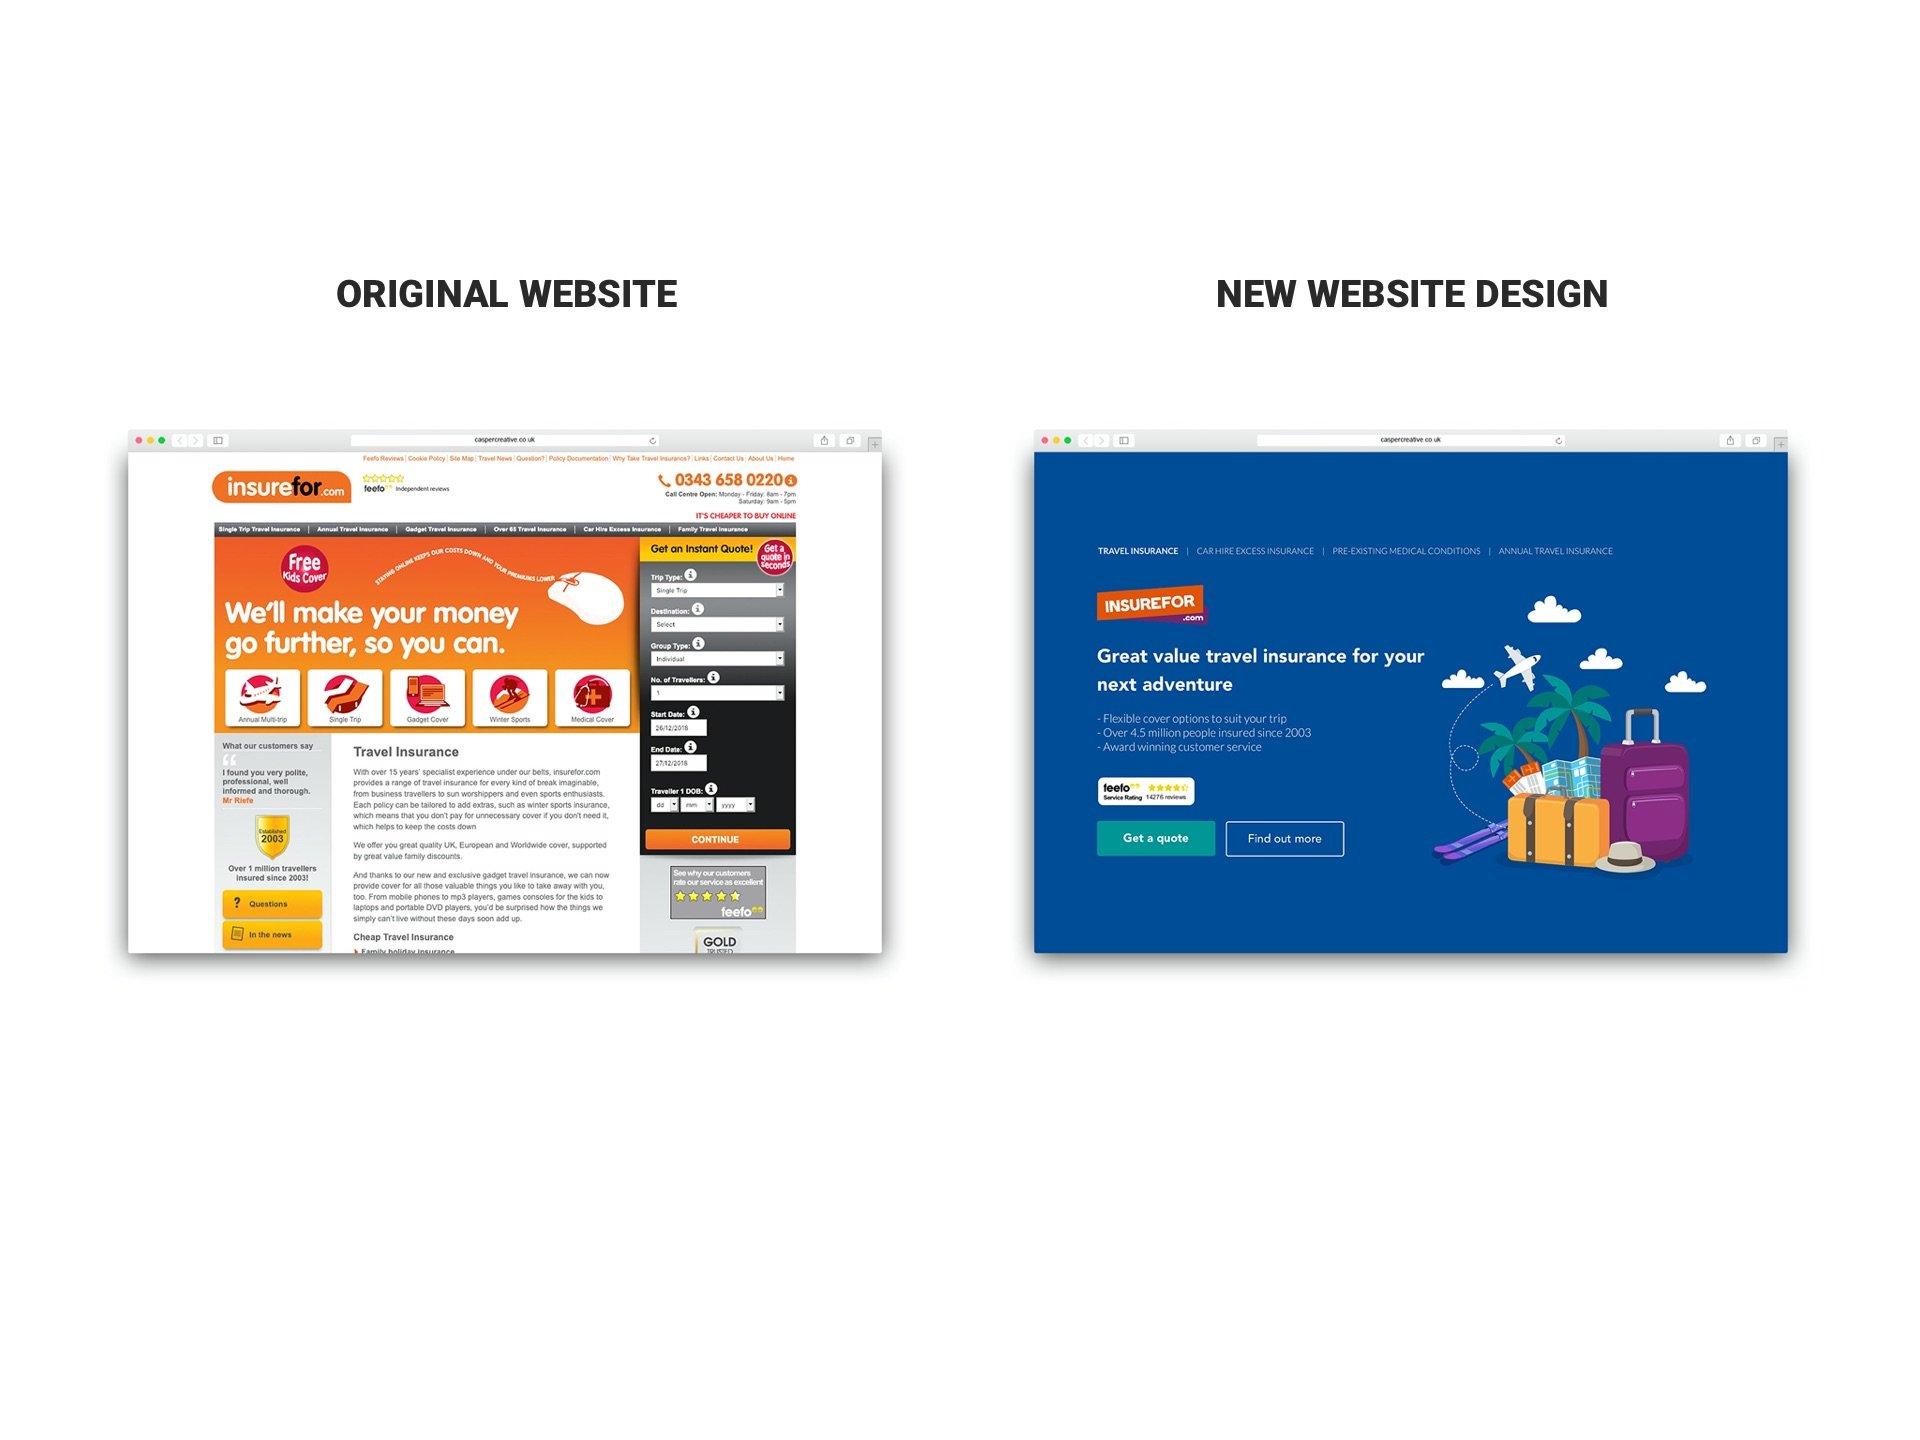 insurefor.com Website rebrand by Casper Creative